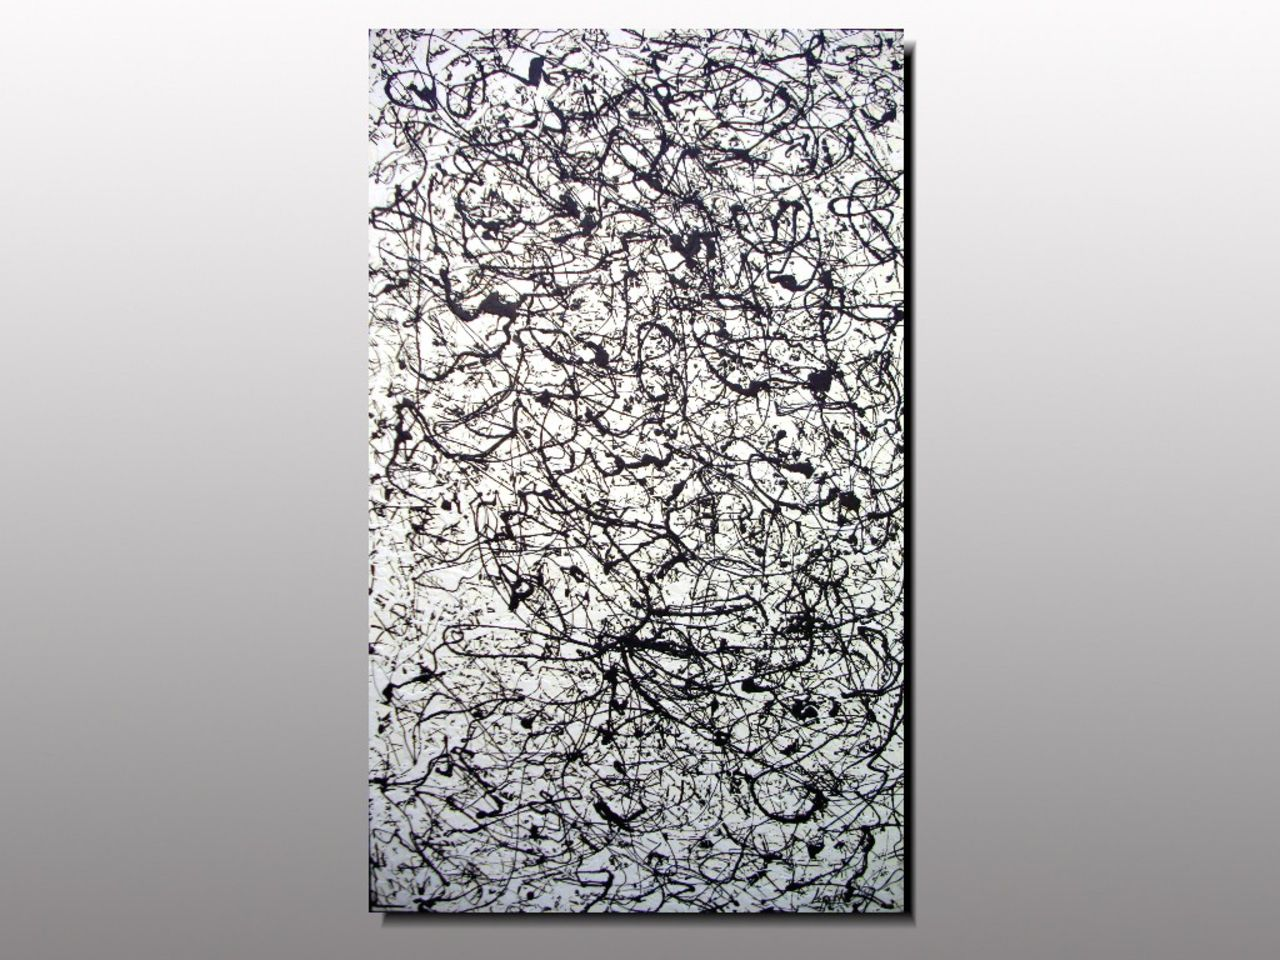 MISTER K  (Lepolsk Matuszewski) MENTOR  Expressionnisme abstrait contemporain